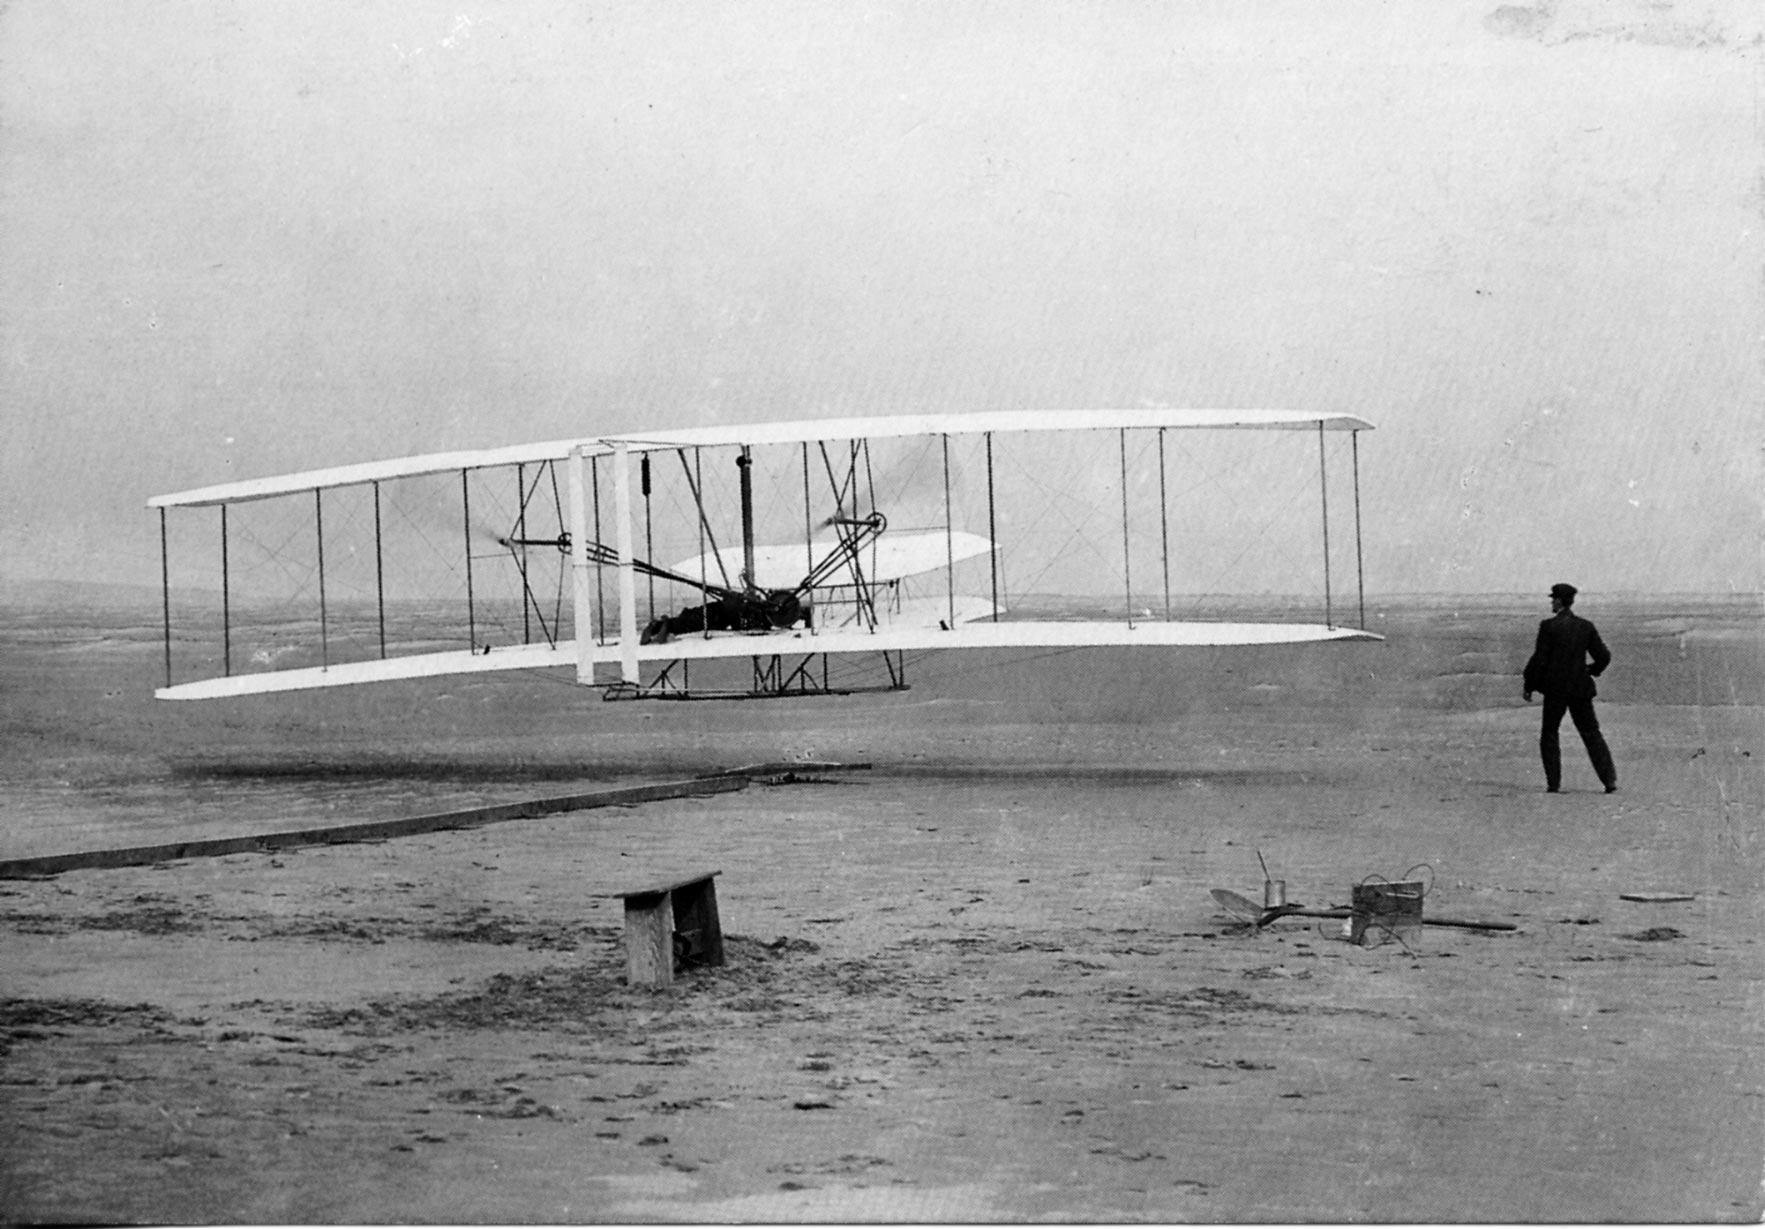 Kitty Hawk Wright Flyer 1913